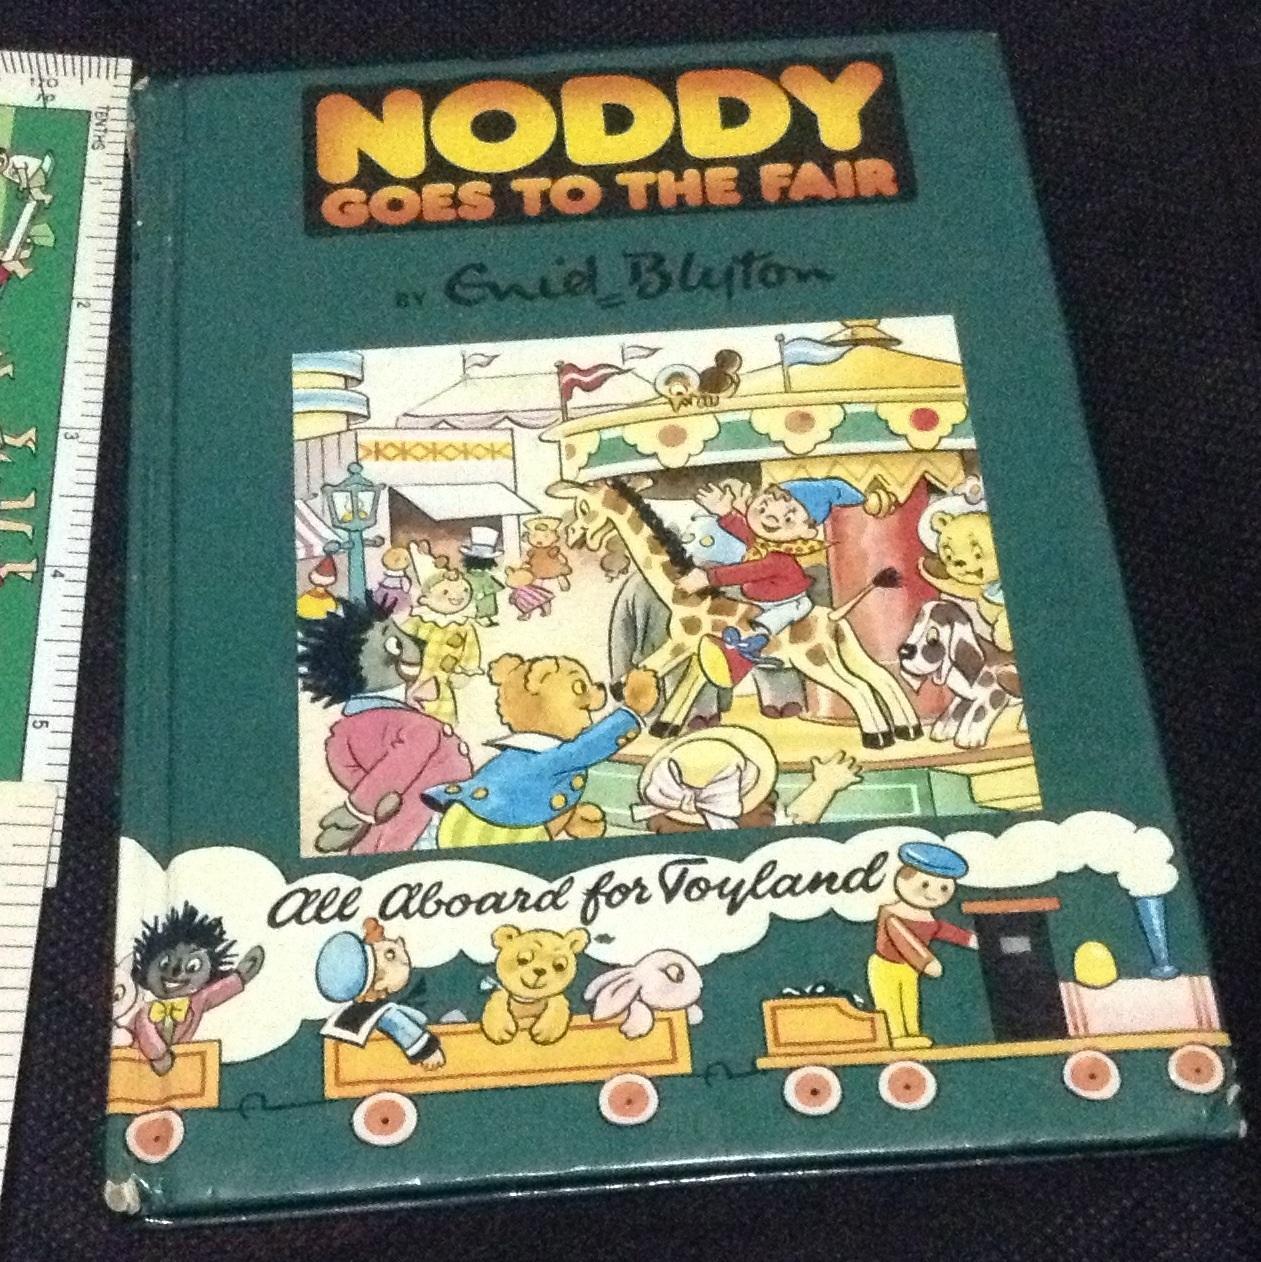 Noddy goes to the fair ปกแข็ง ราคา 100